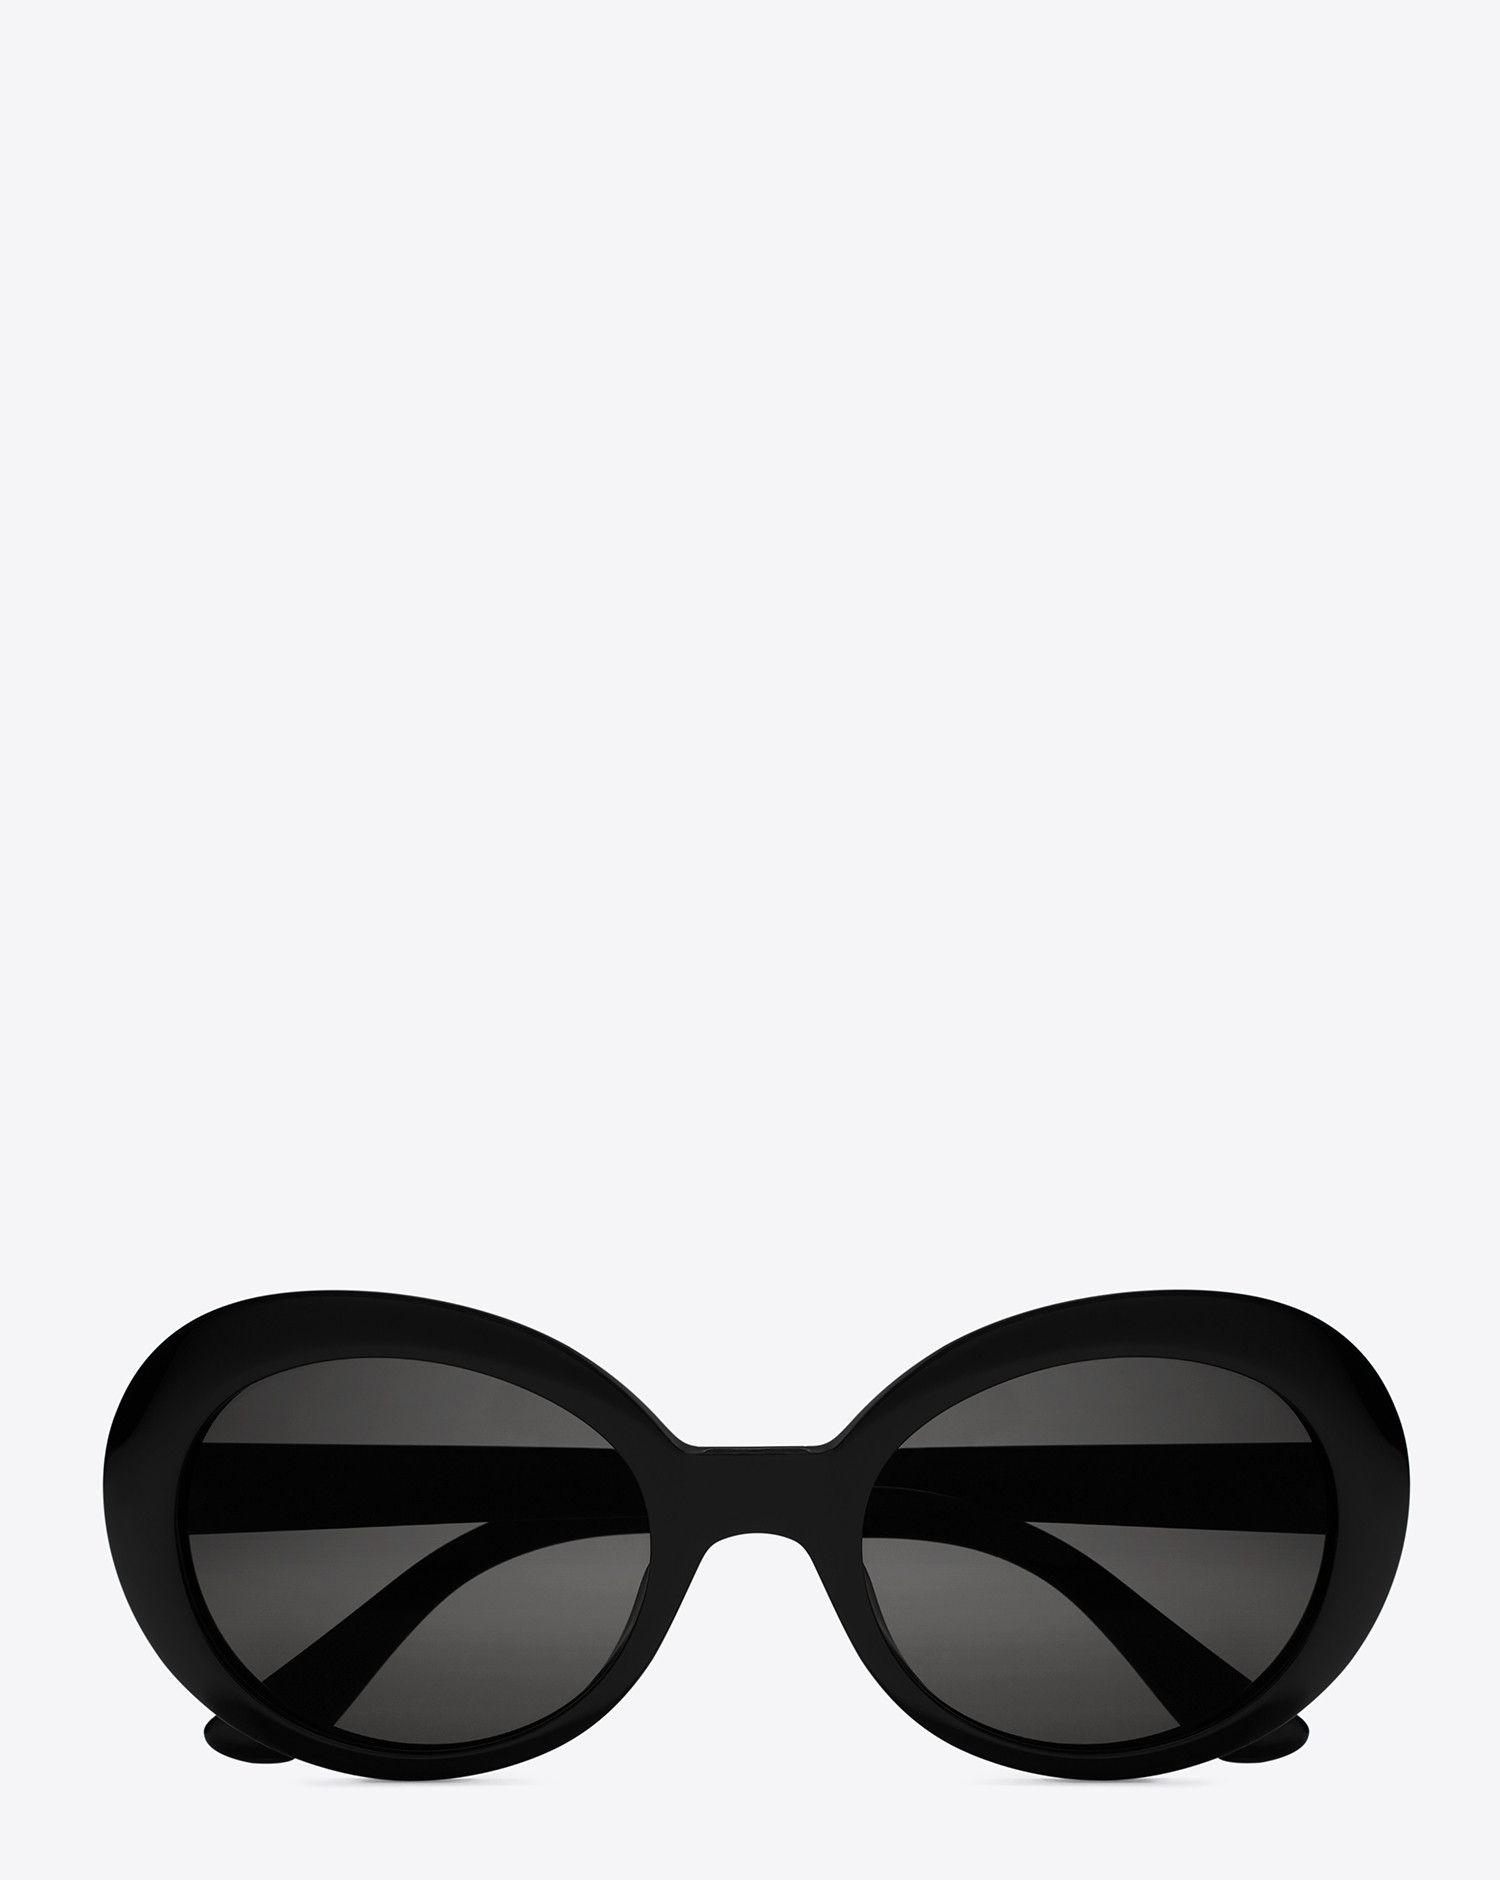 f6075197fc Saint Laurent New Wave 98 California Sunglasses In Black Acetate With Smoke  Lenses